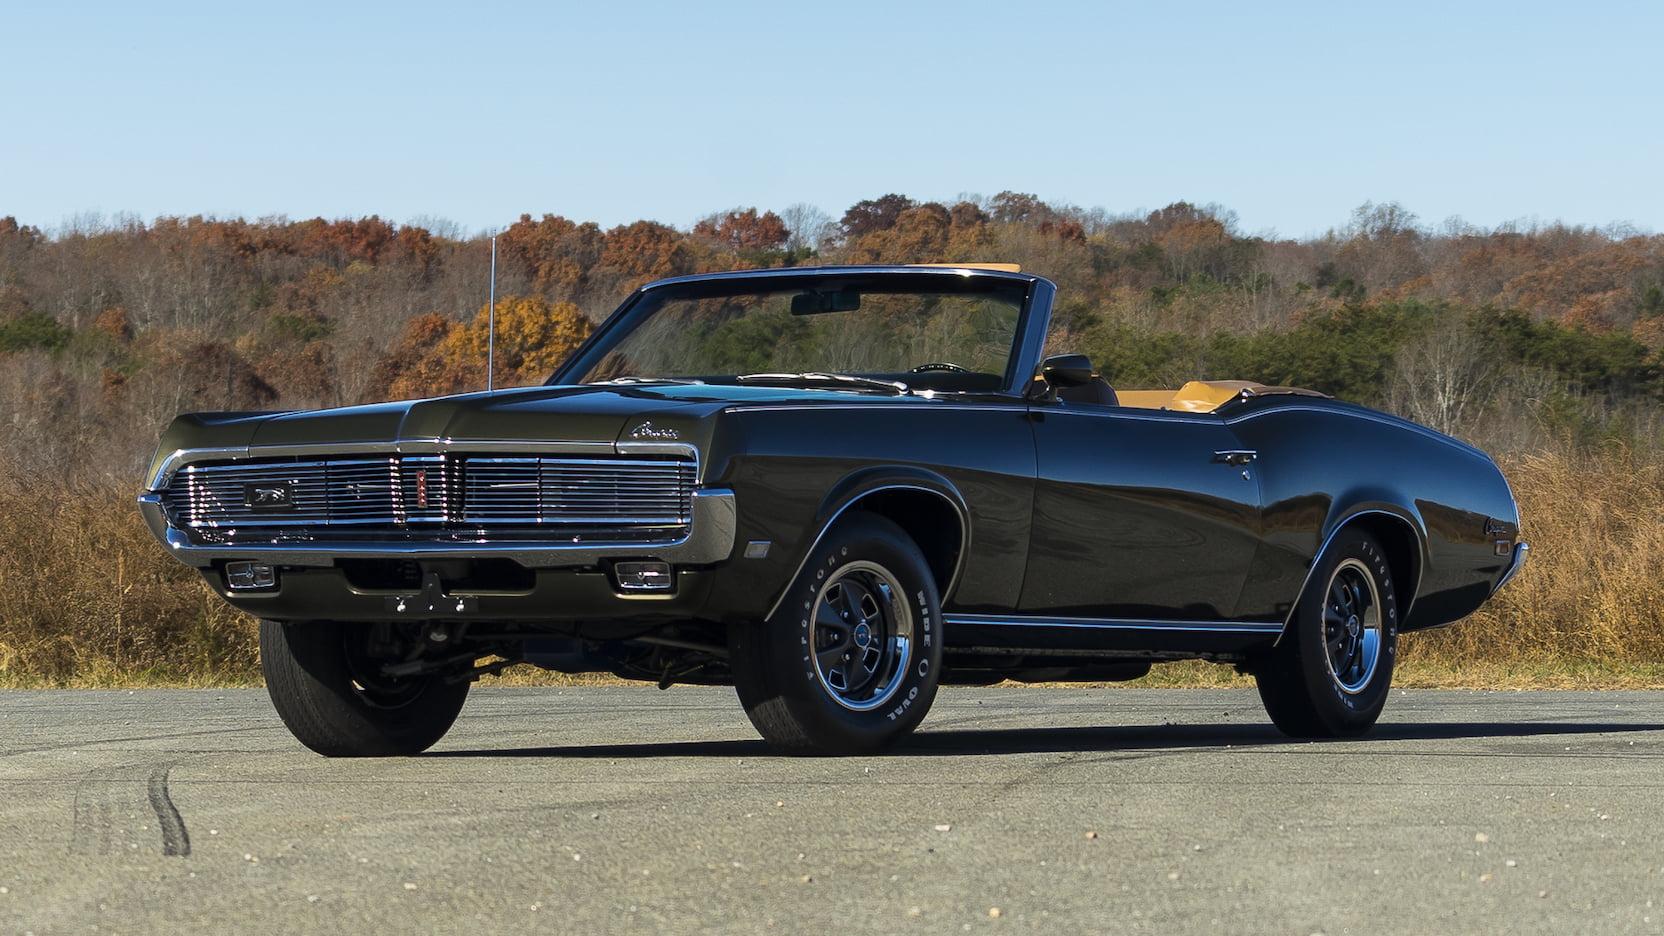 1969 Mercury Cougar brown convertible